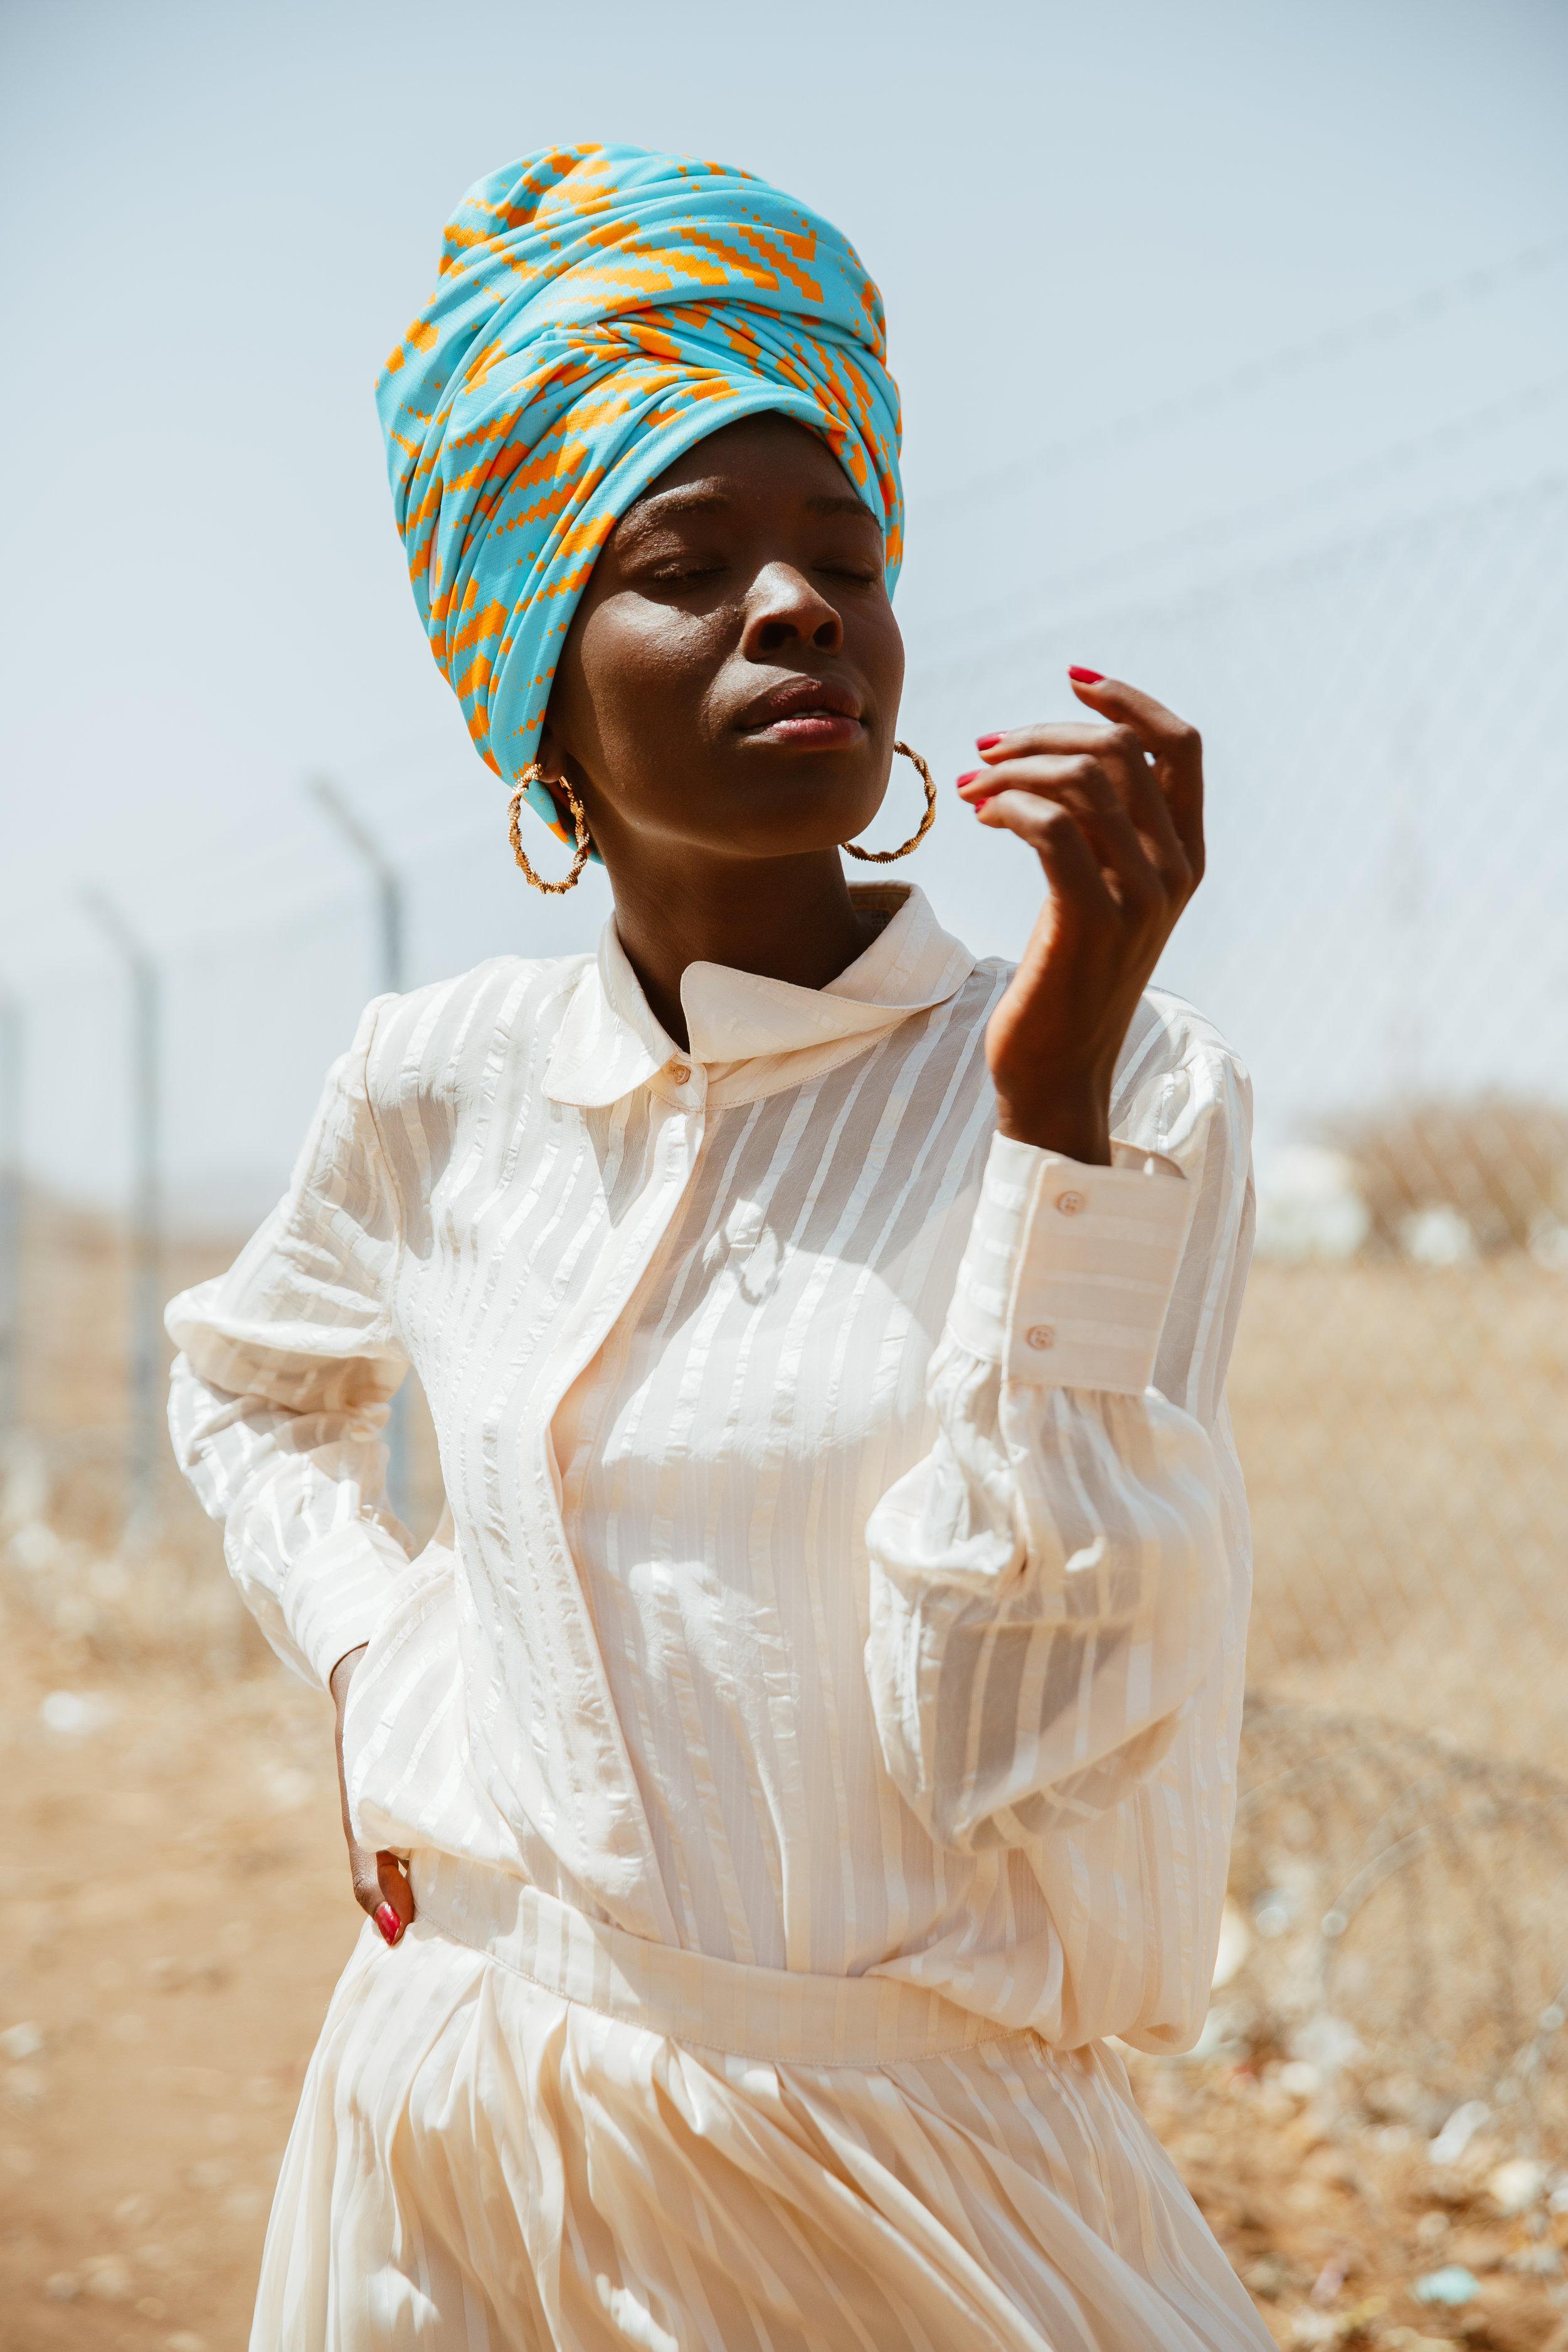 09_KLABU Campaign image _ by Coco Olakunle.jpg